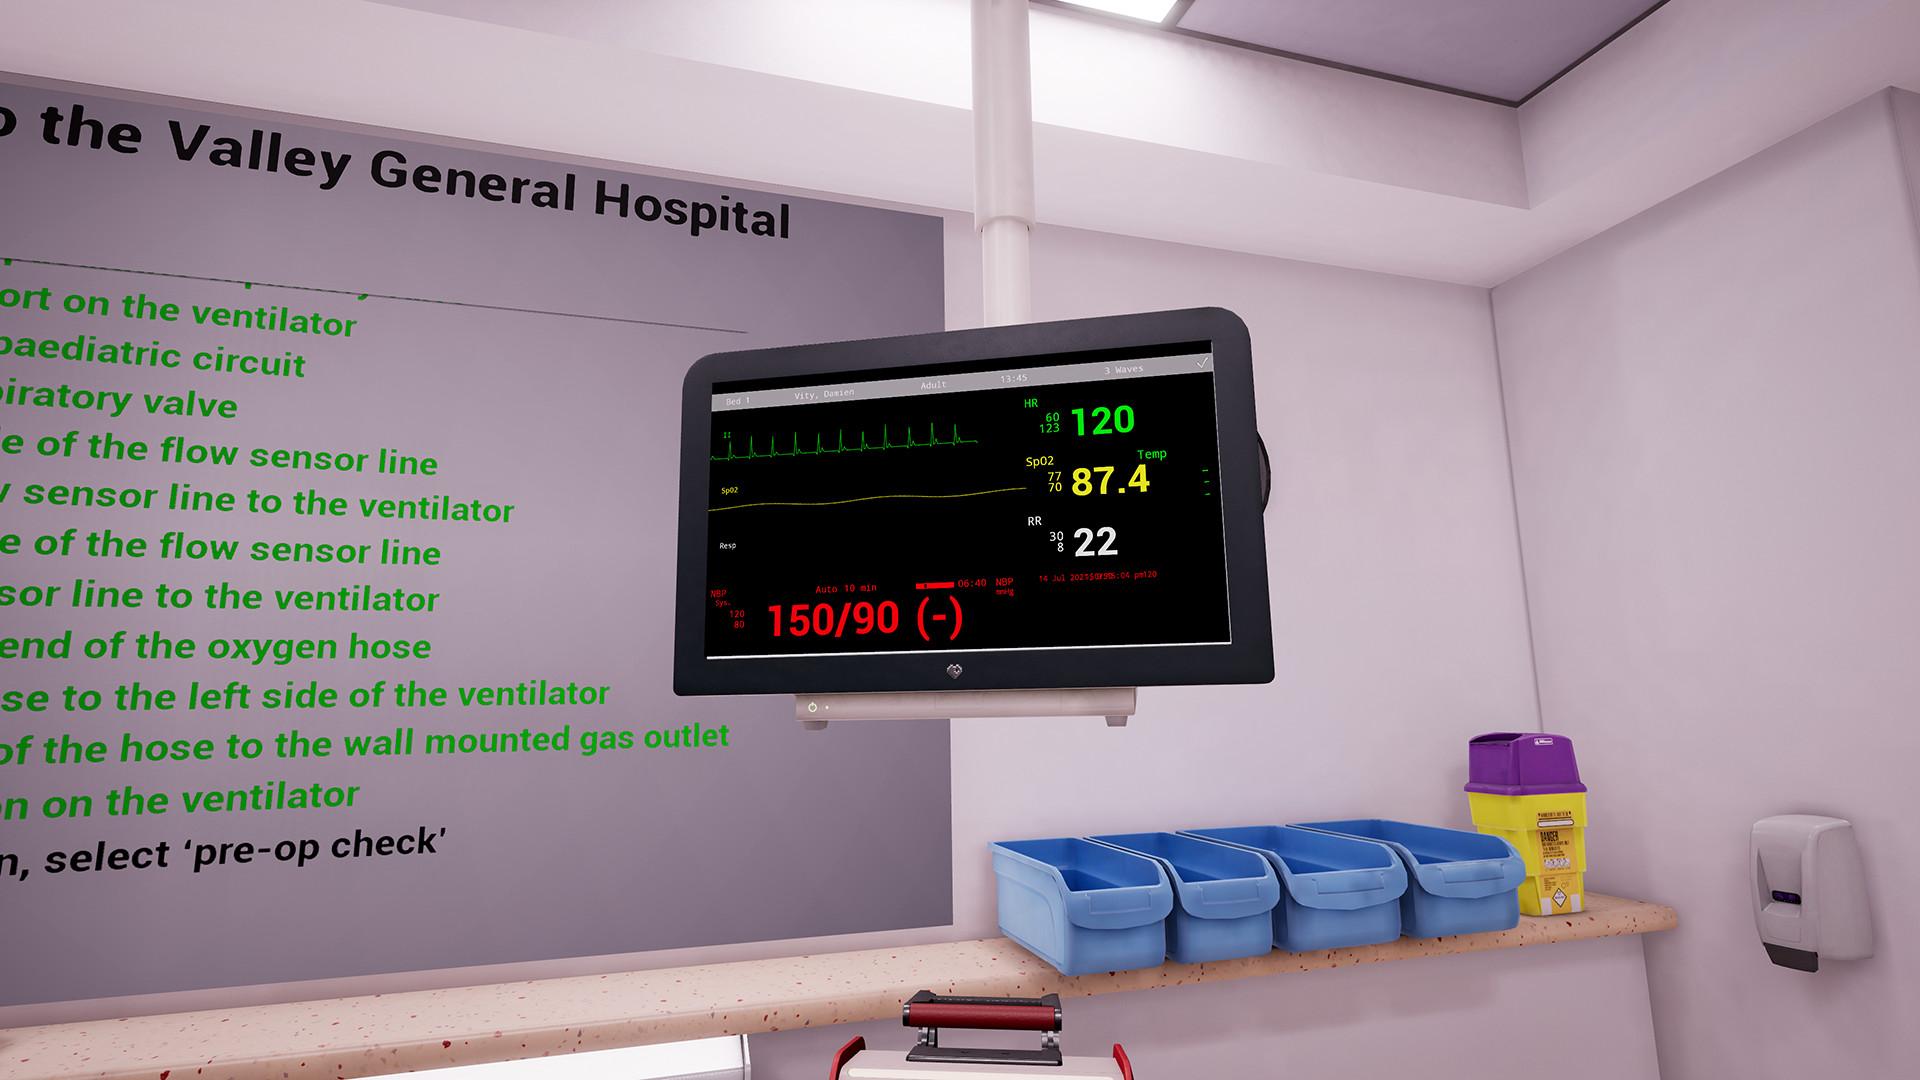 Valley General Hospital: NiVR Free Download